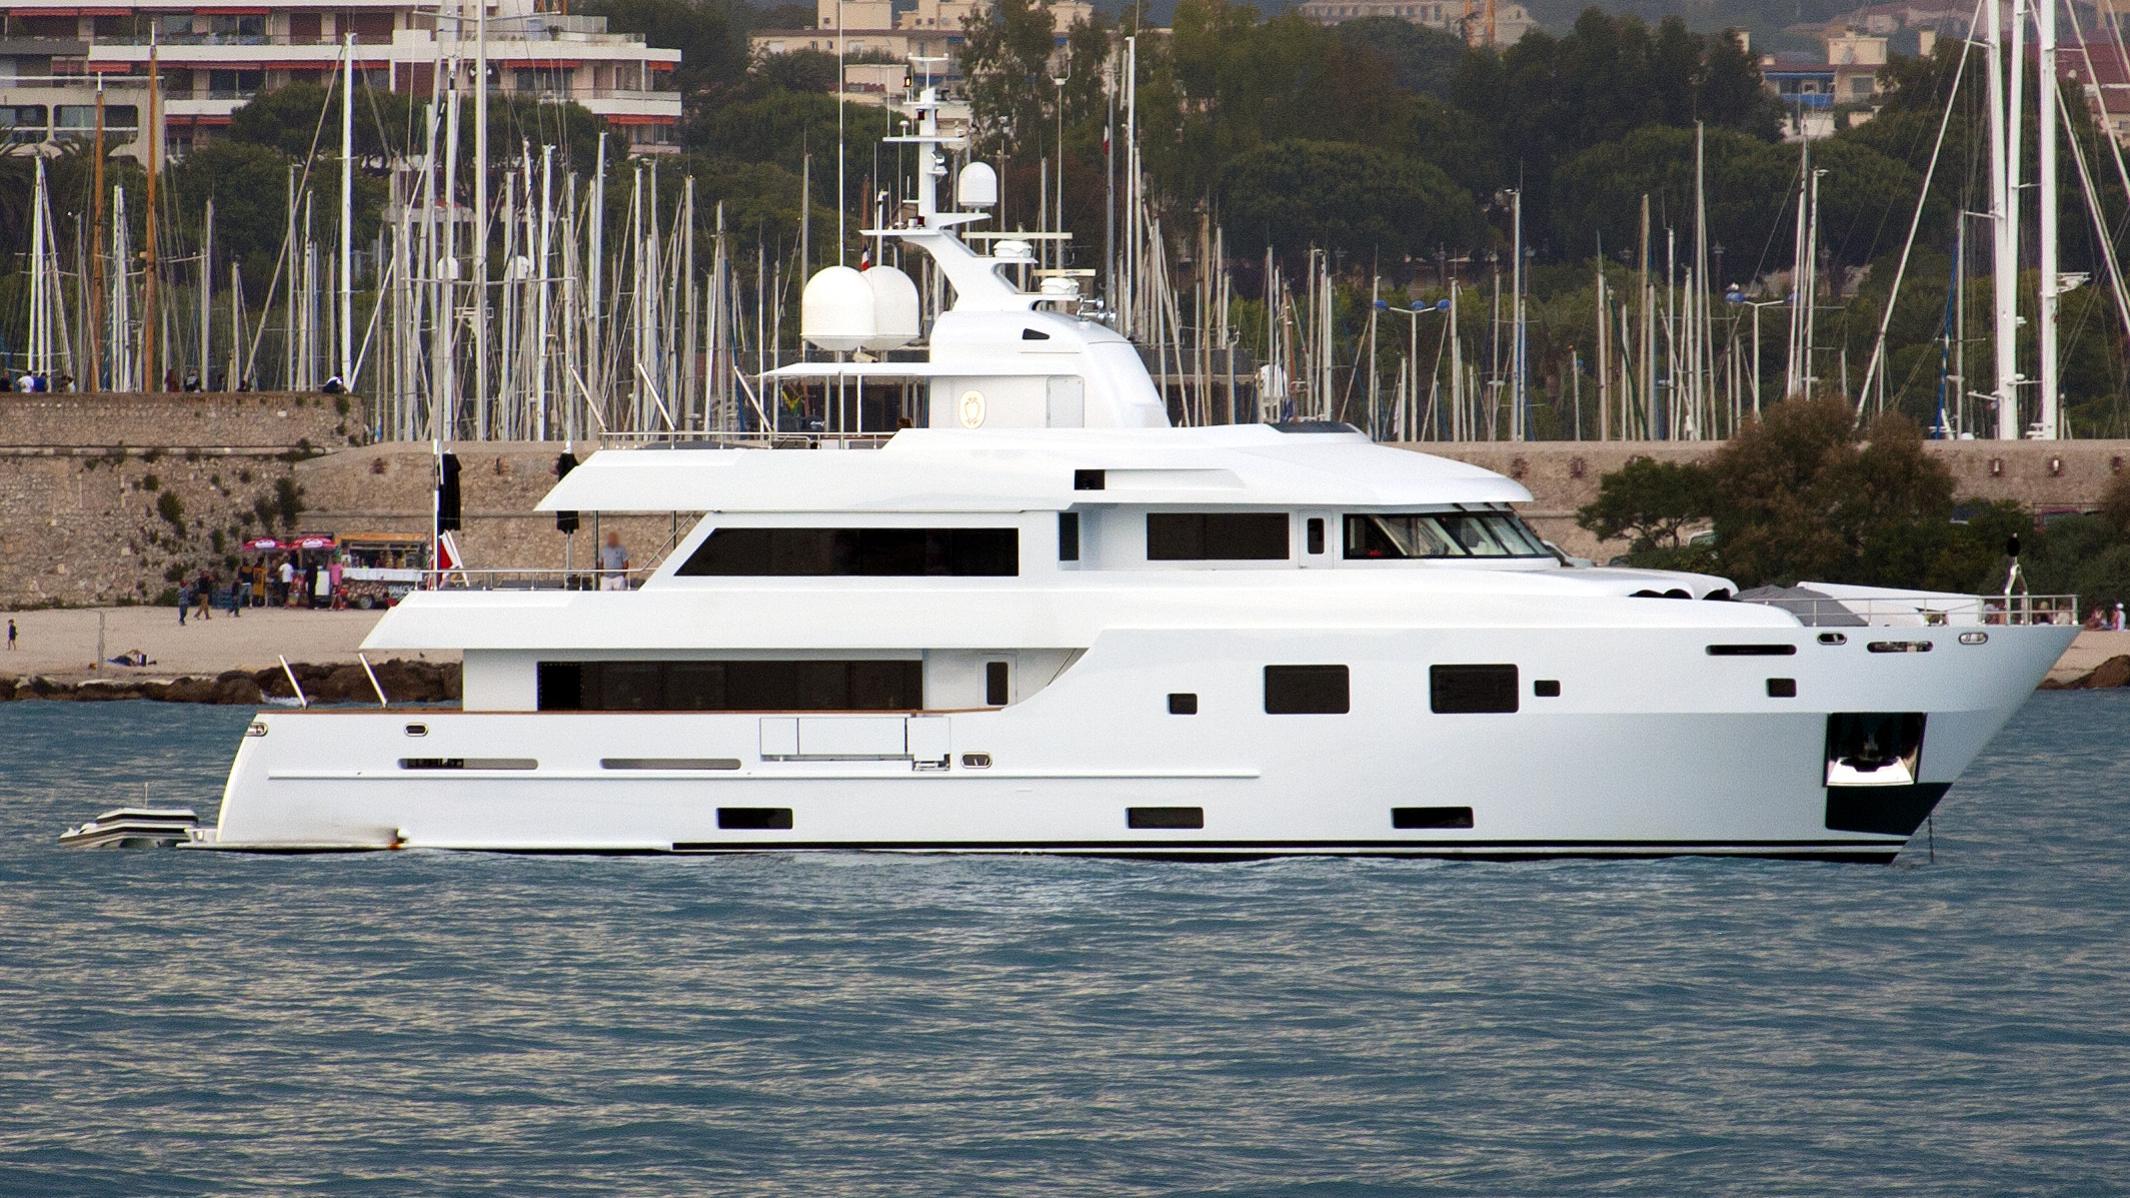 tommy belle jbh motoryacht lubeck yachts 35m 2011 profile